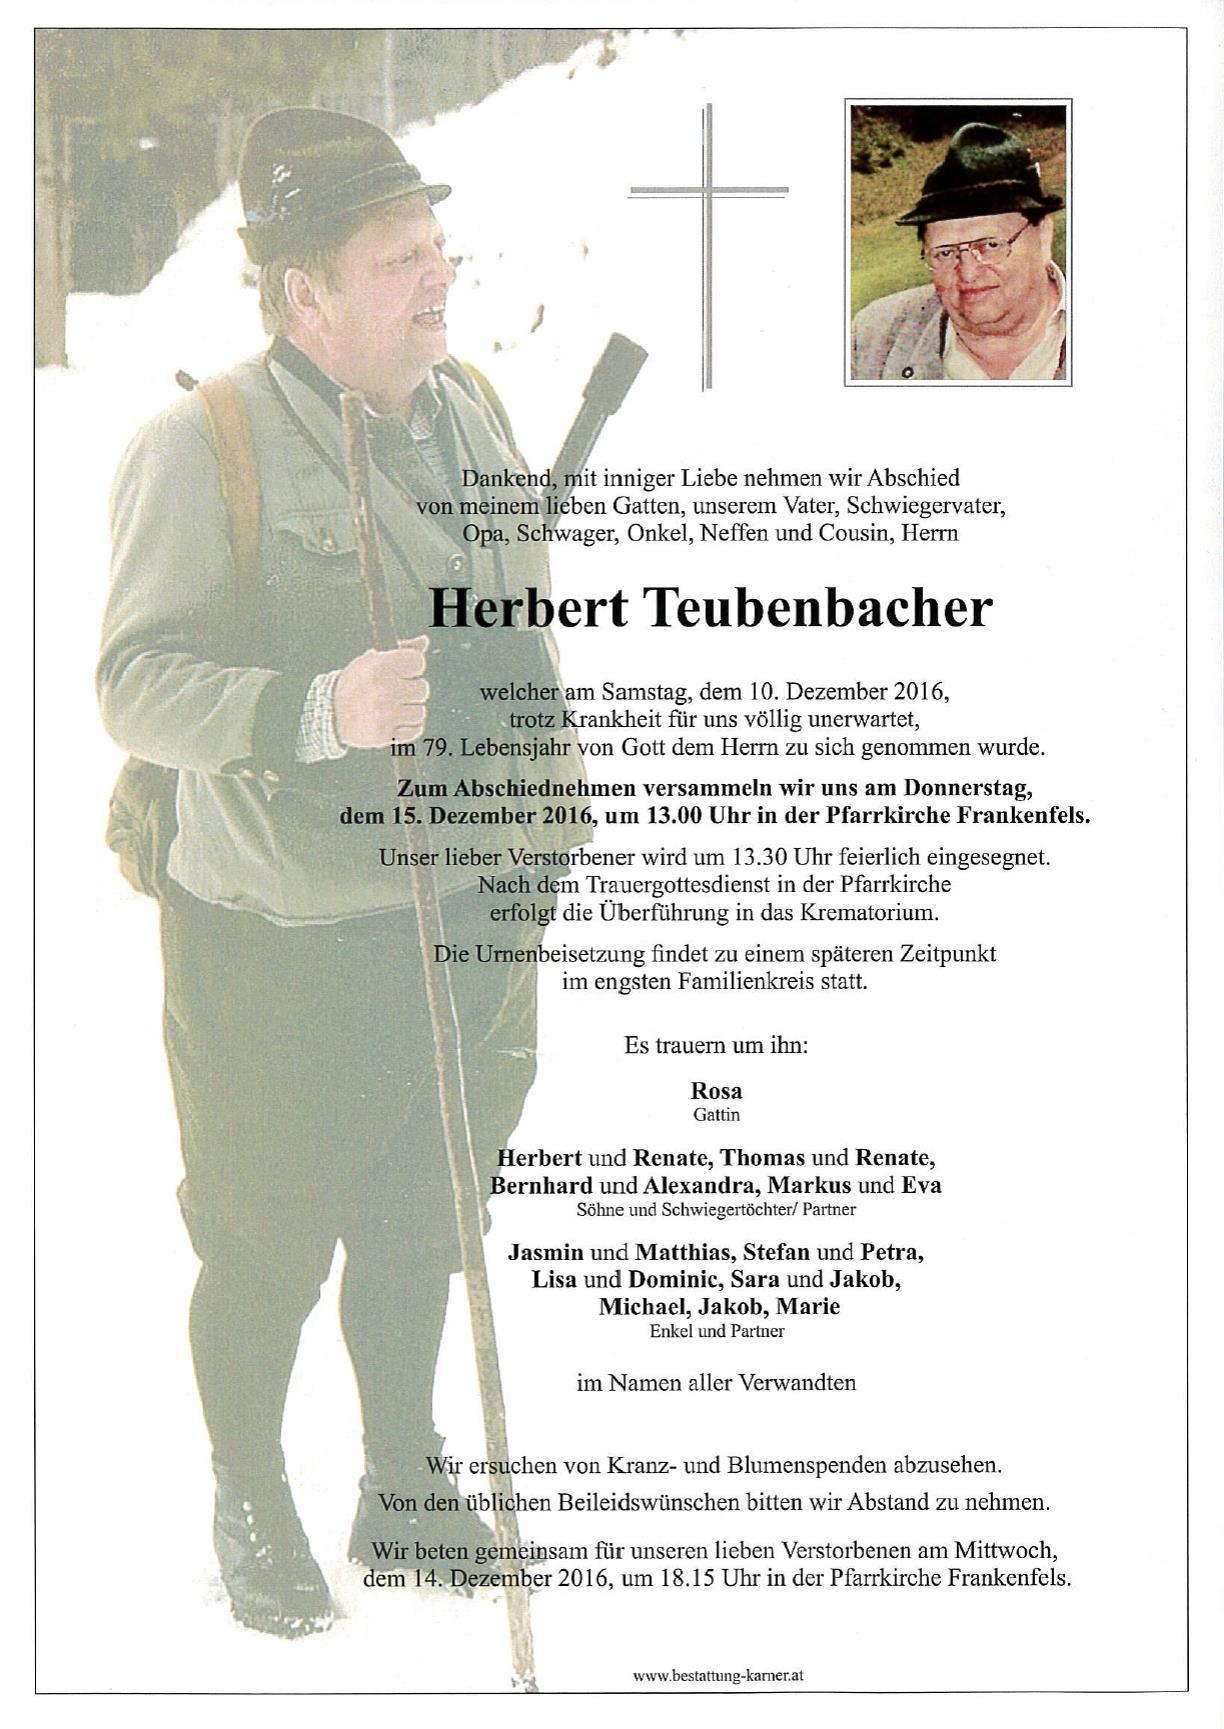 herbert-teubenbacher